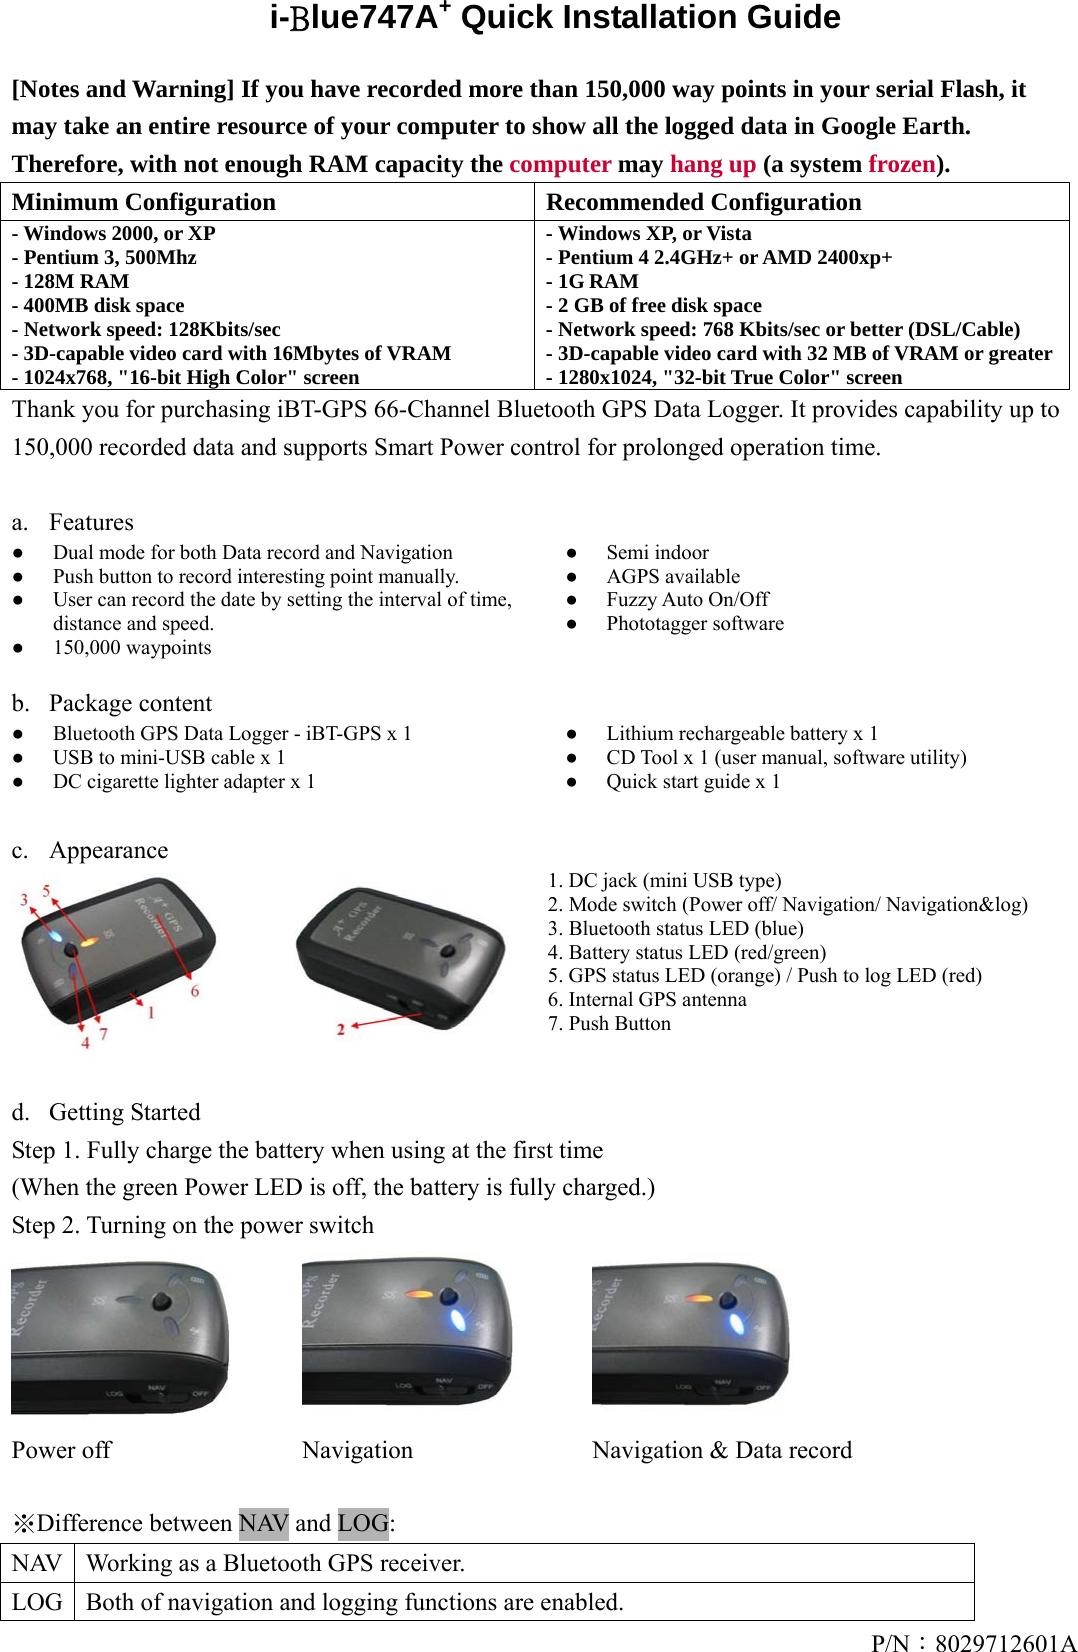 Transystem 971260101 Gps Trip Recorder User Manual Userman 3 Way Navigation Switch